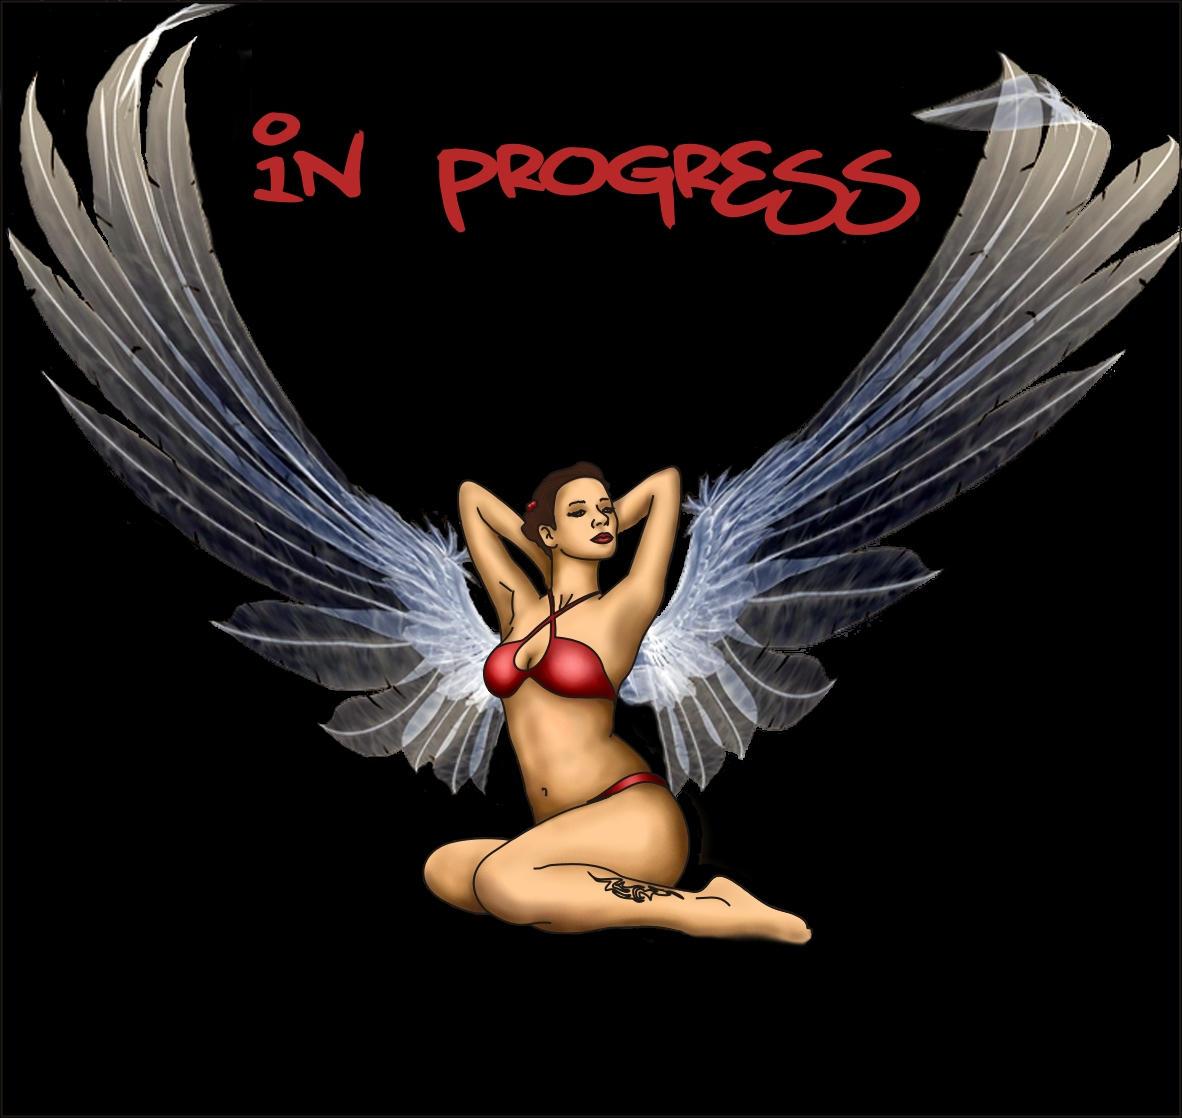 angel-Minn-step-01 by venonded